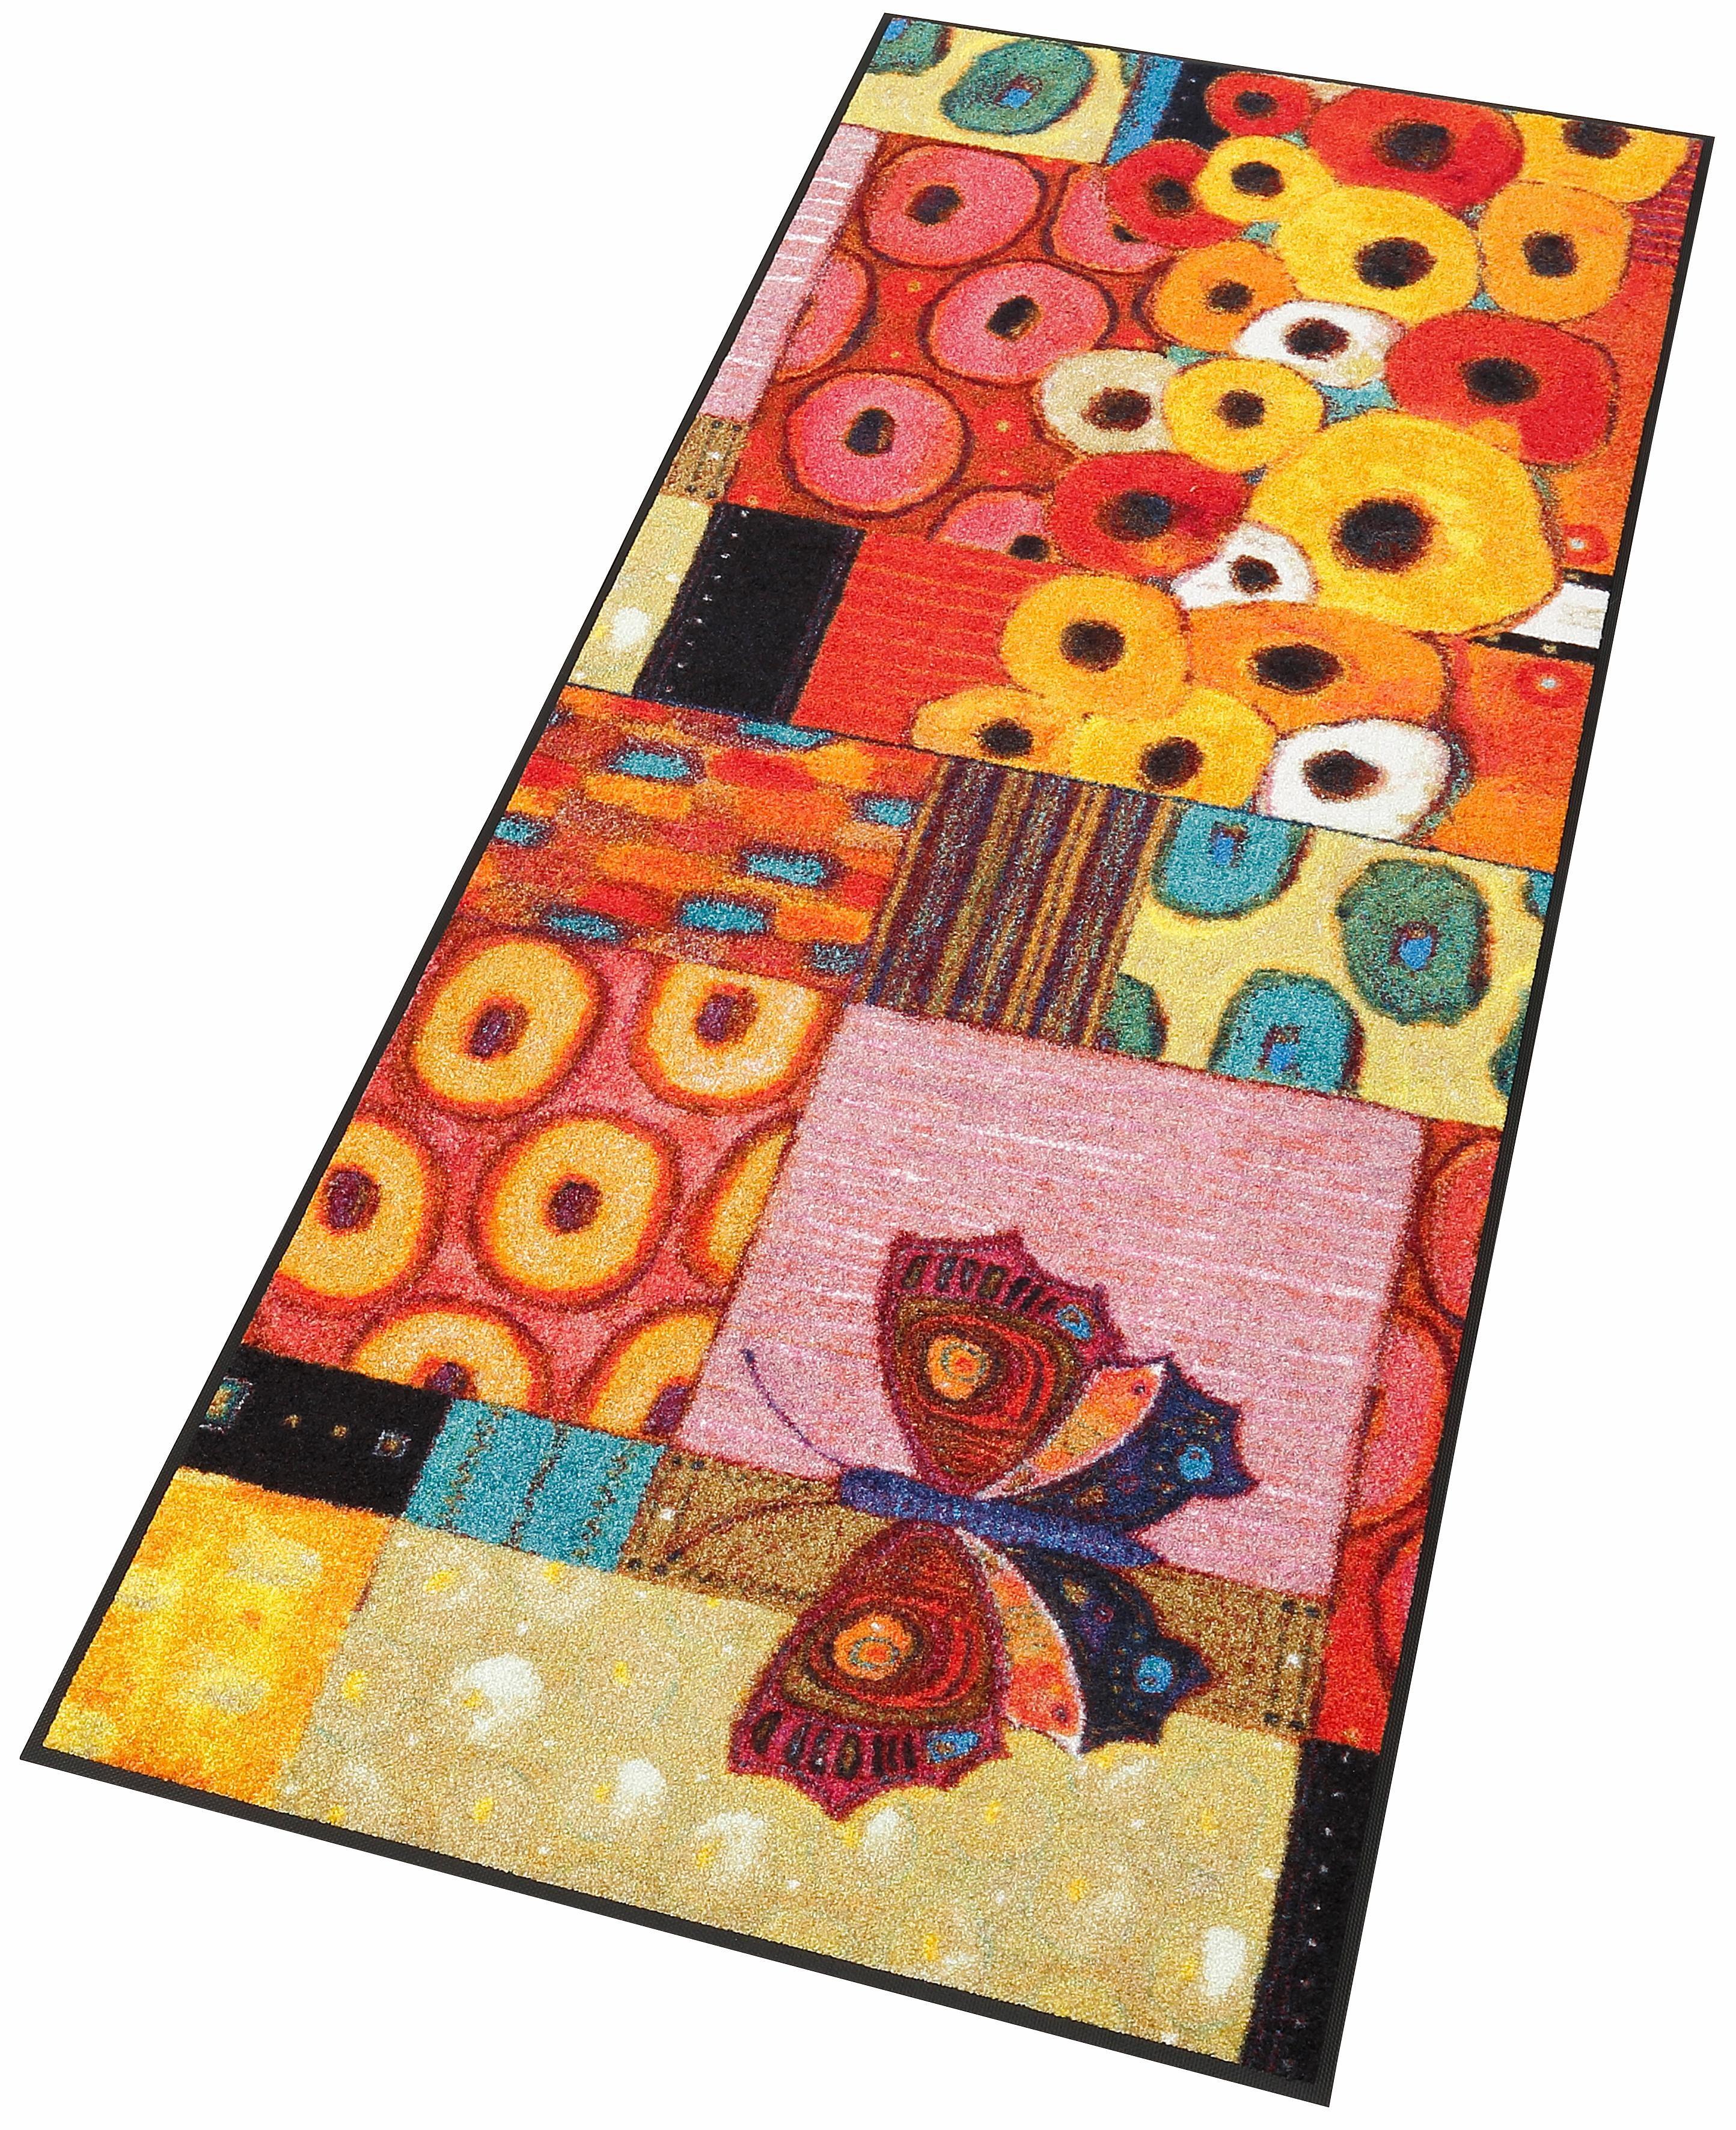 Läufer Colourful Moment wash+dry by Kleen-Tex rechteckig Höhe 7 mm gedruckt